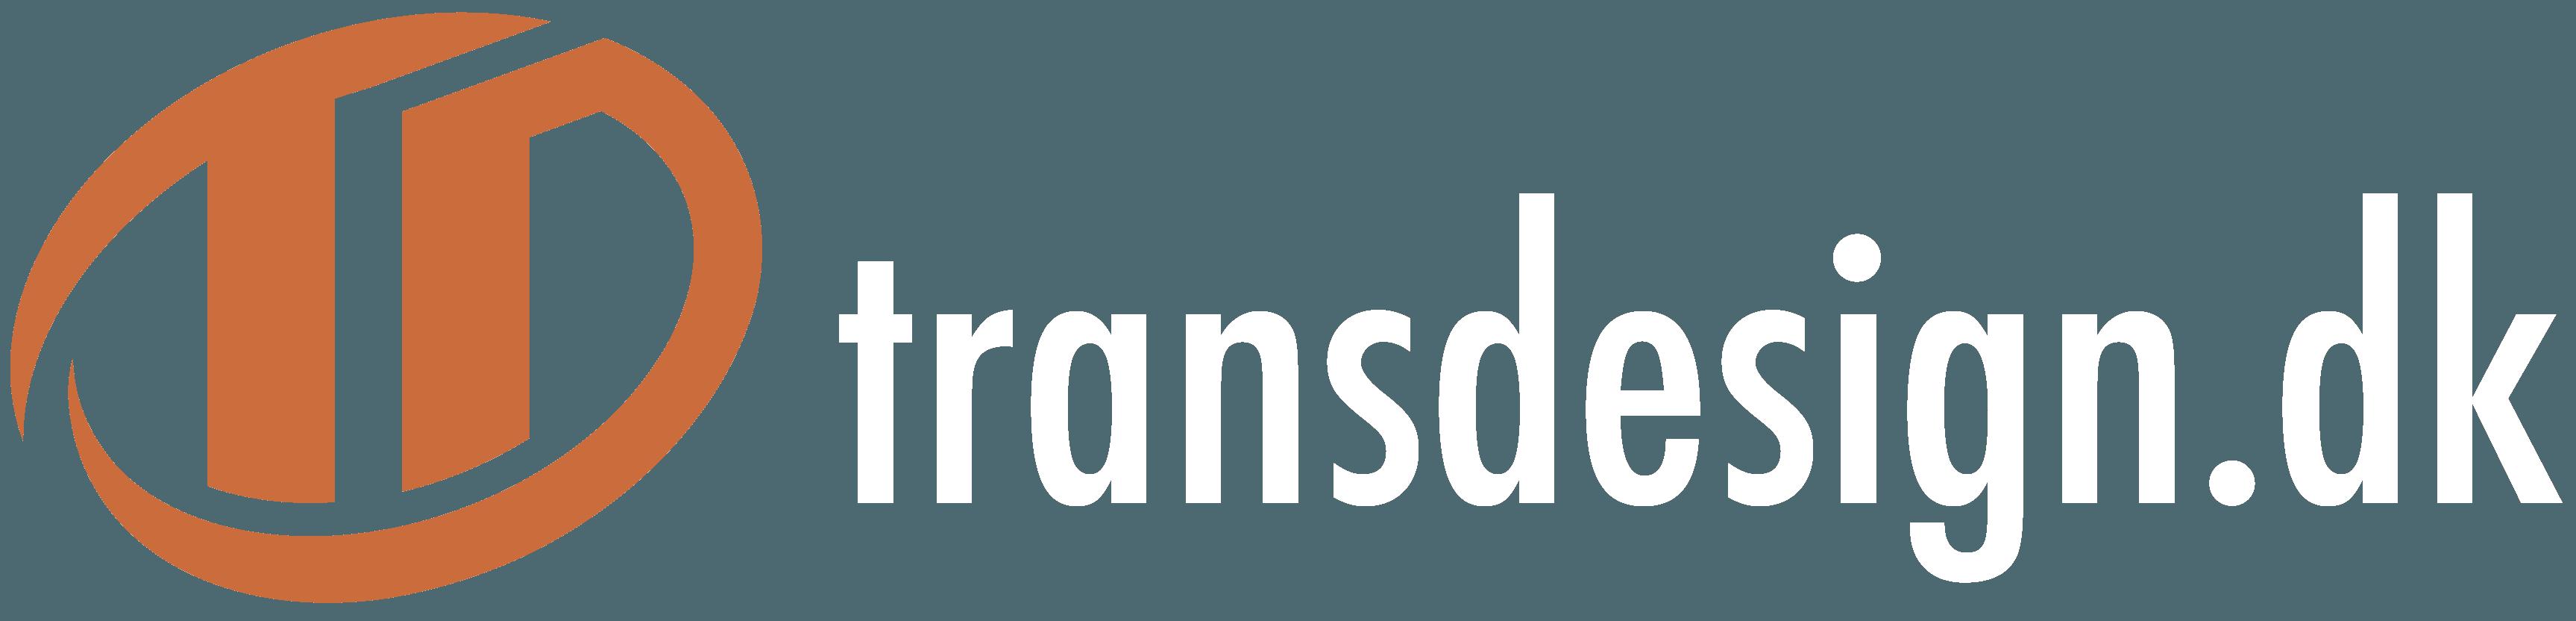 Transdesign.dk